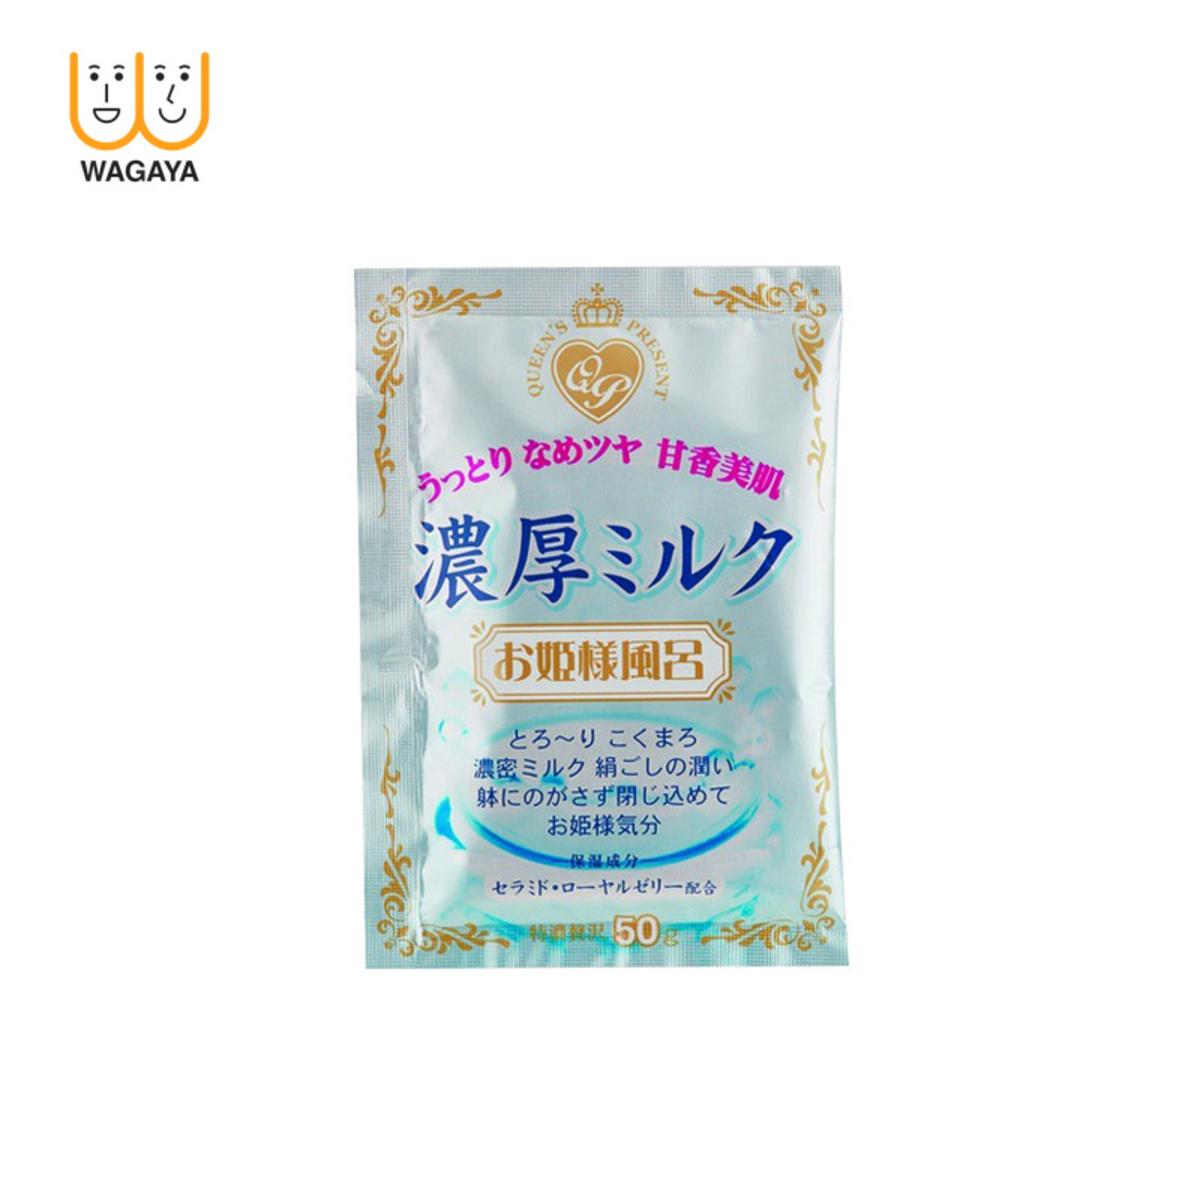 Princess Bathtime (Milk) 50g